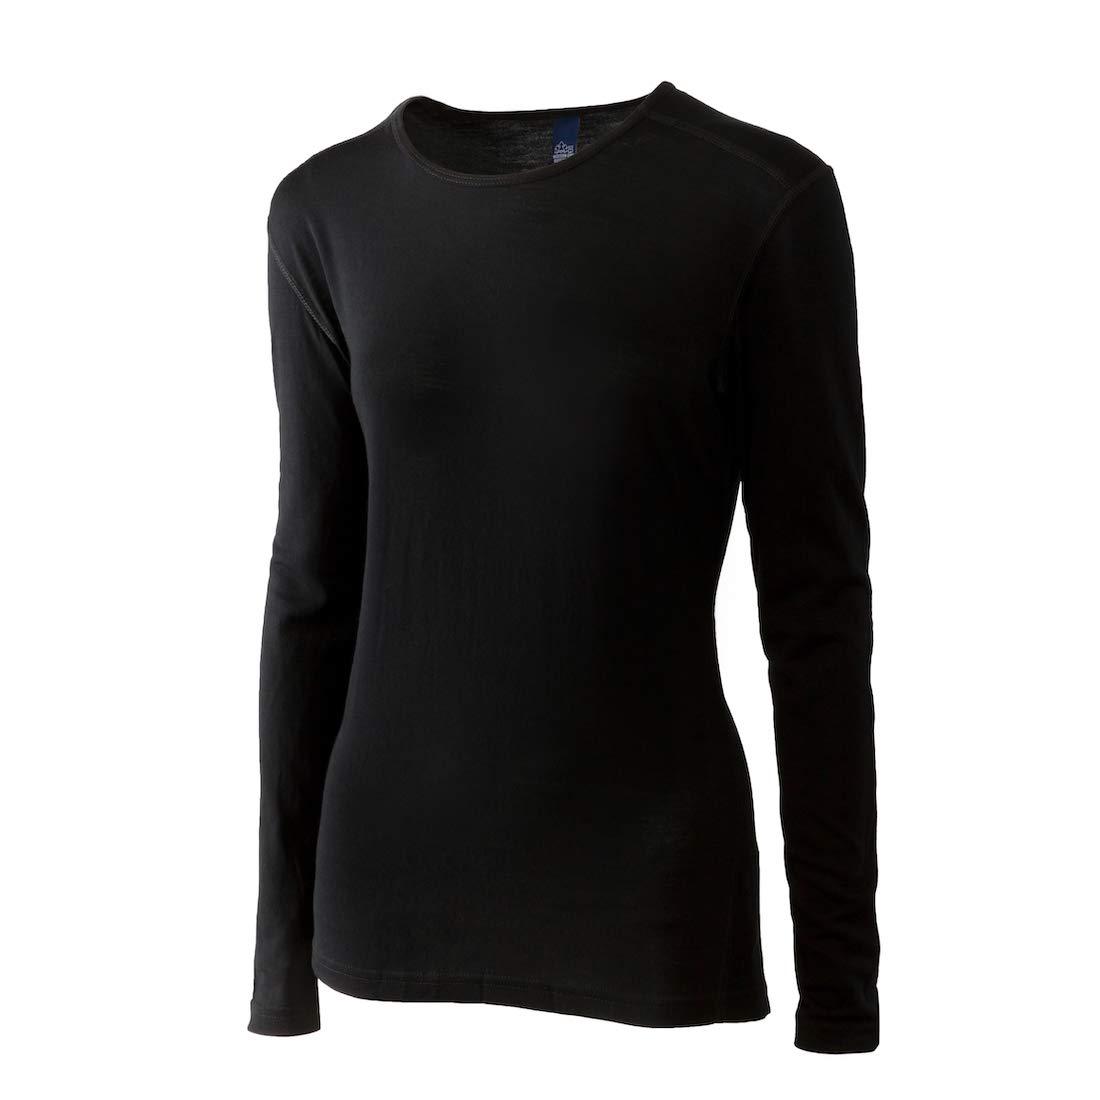 Merino Wool Women's Long Sleeve Top | Crew Neck Shirt- Lightweight, Moisture Wicking - Top Base Layer | 100% Australian Merino Wool (Medium, Black)